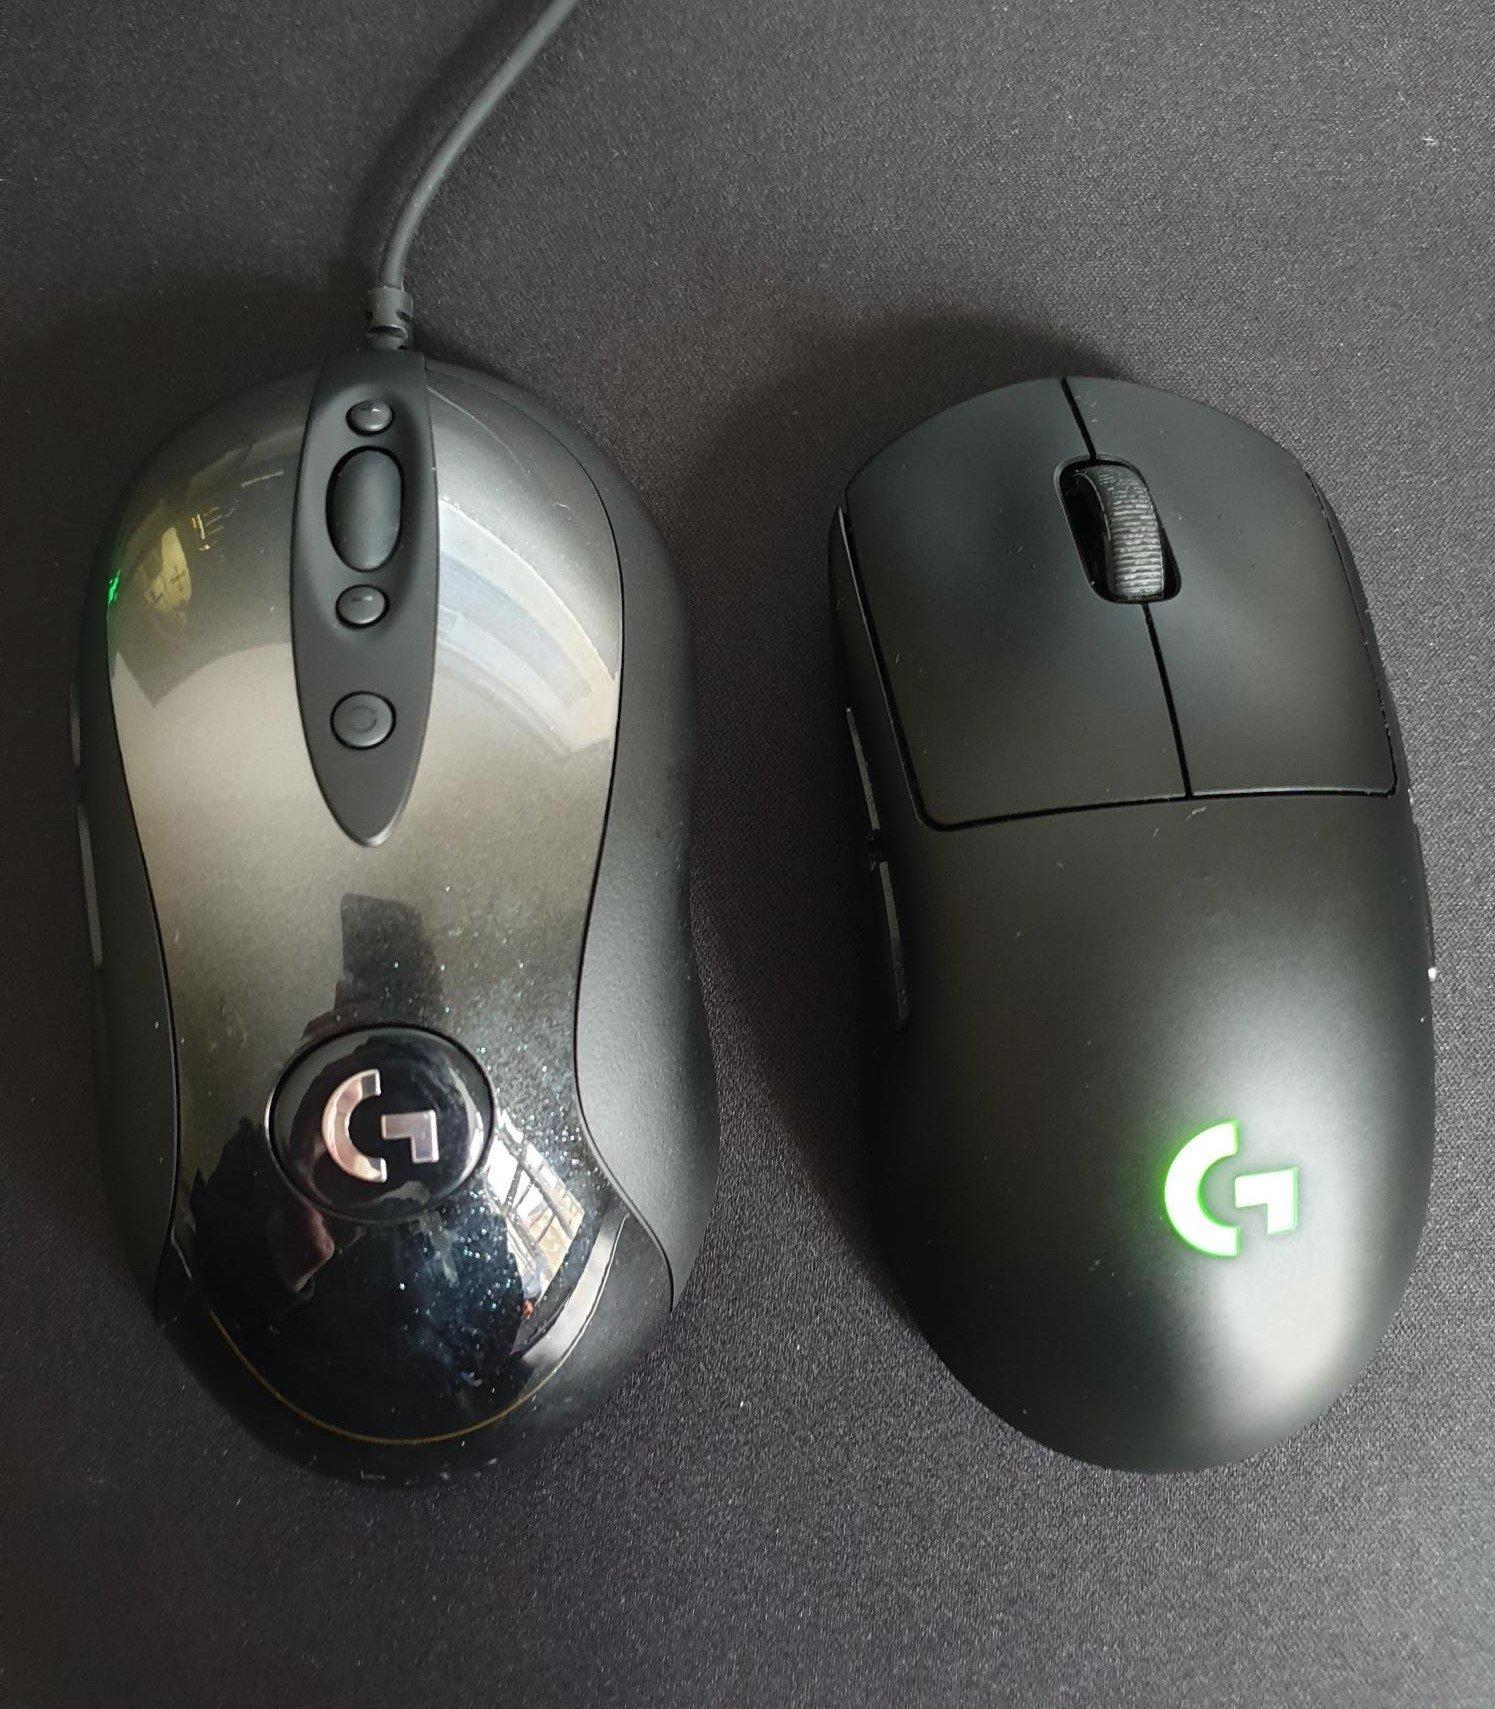 Image comparison of Logitech MX518 and G Pro